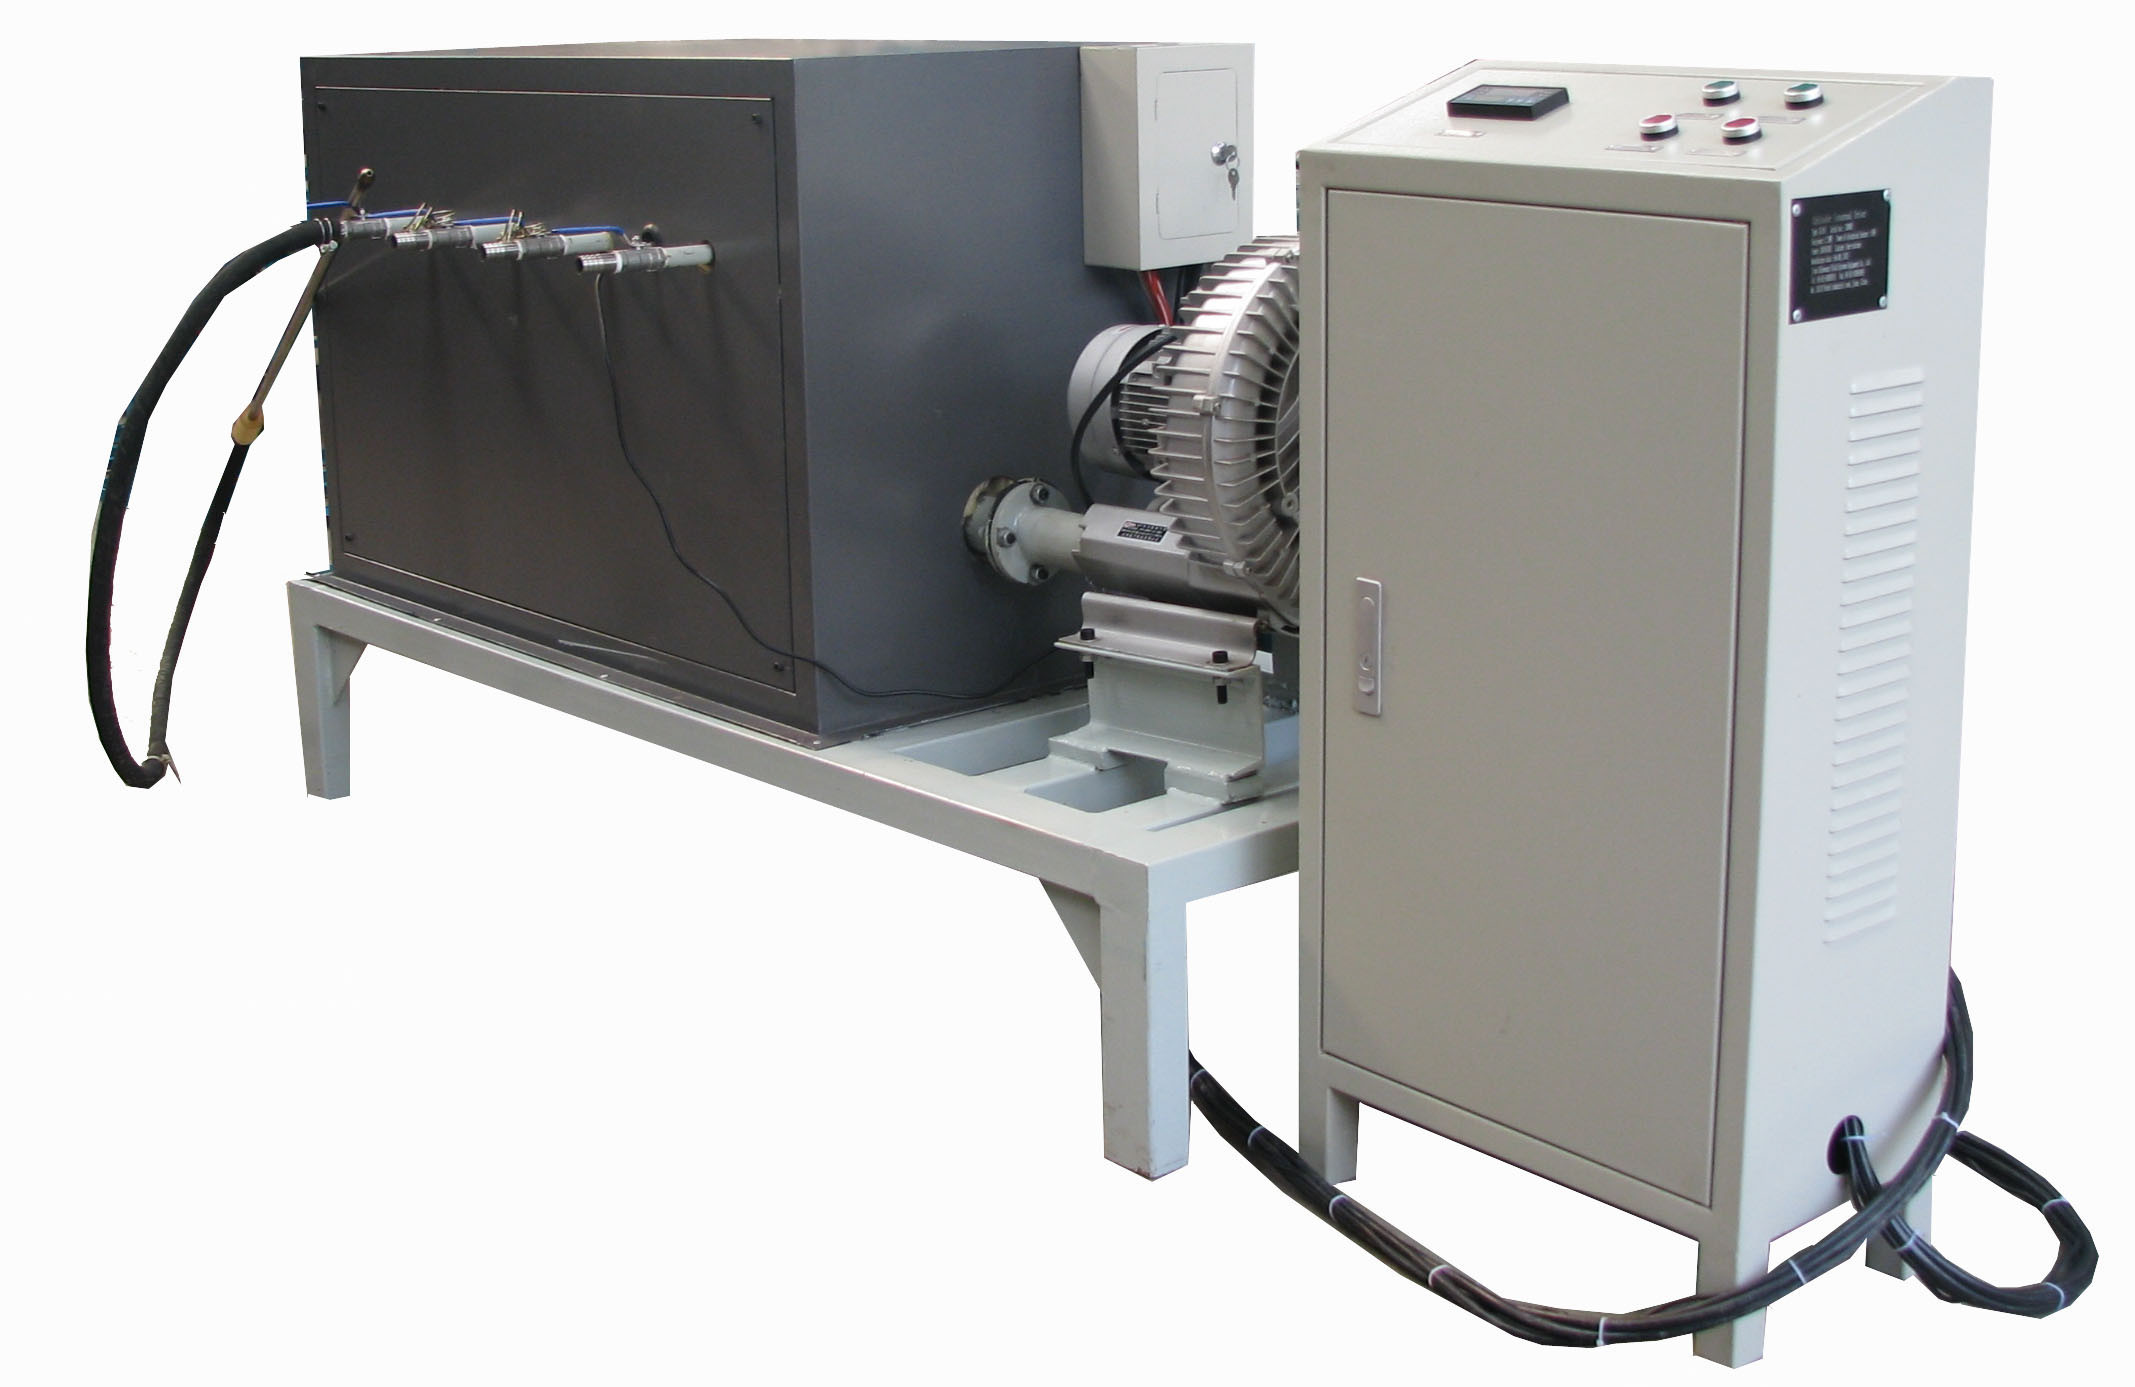 Gz-02 Cylinder Internal Dryer, 2013